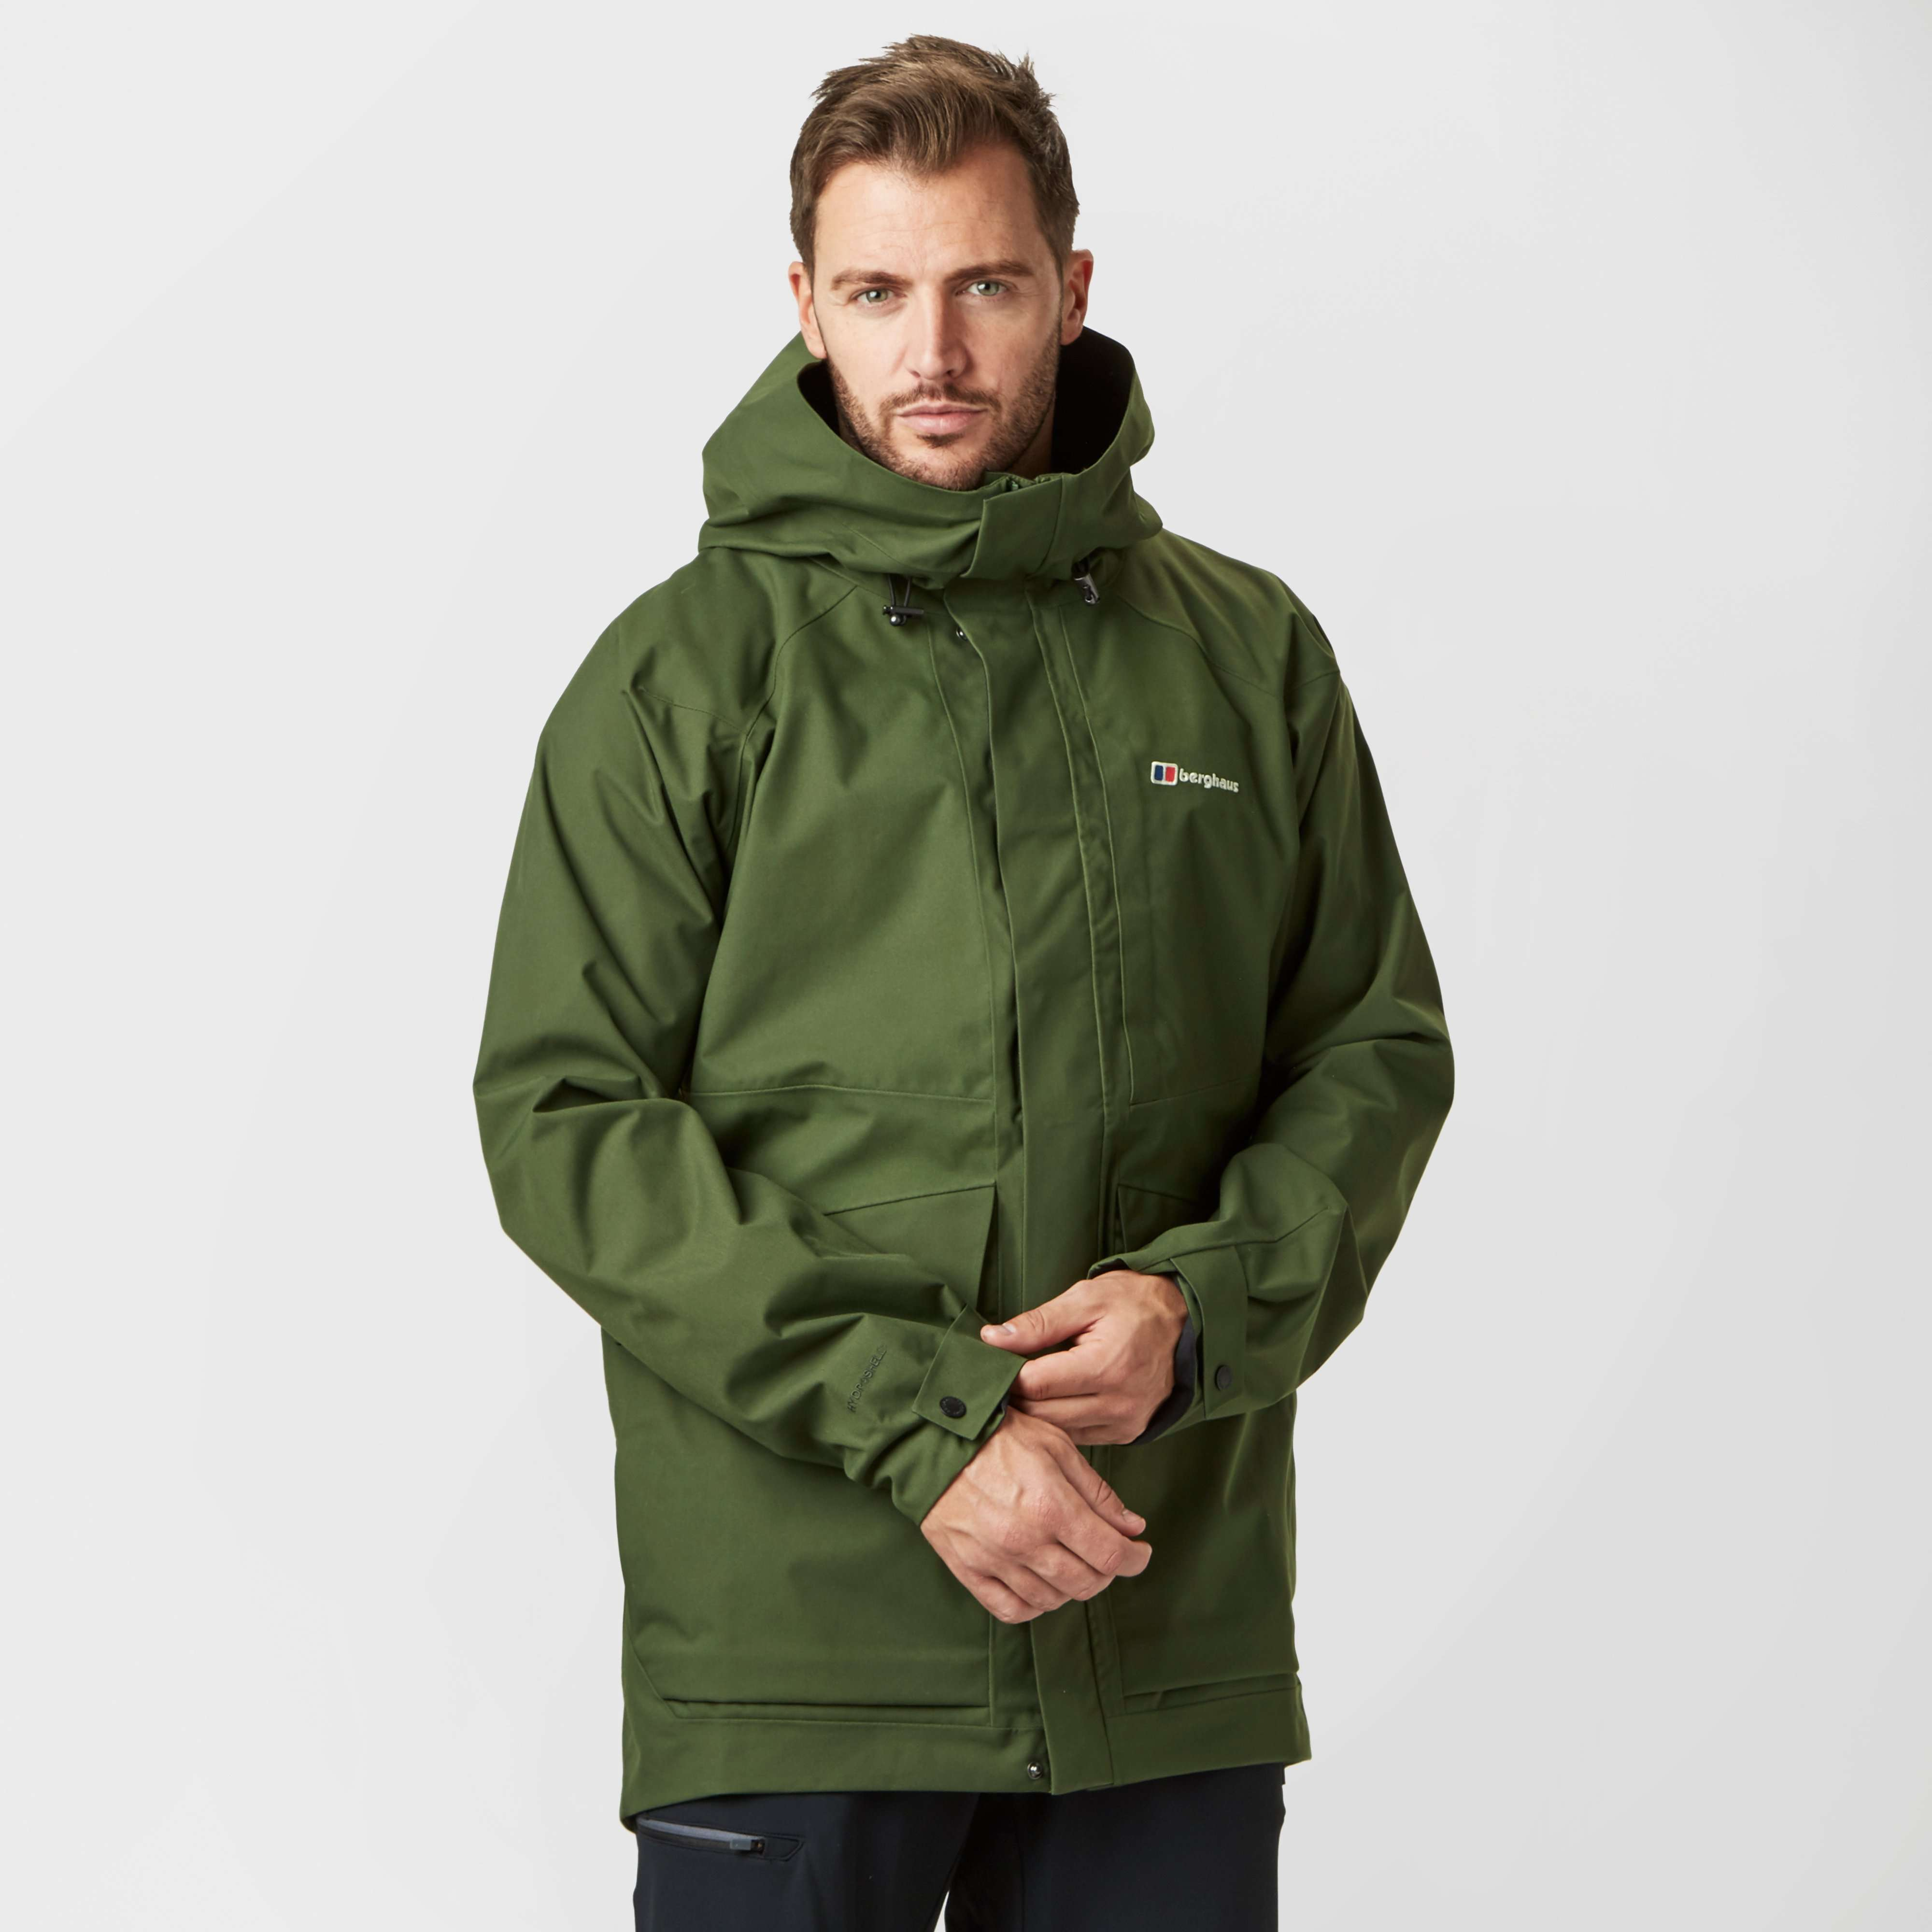 BERGHAUS Men's Stiloy Waterproof Jacket